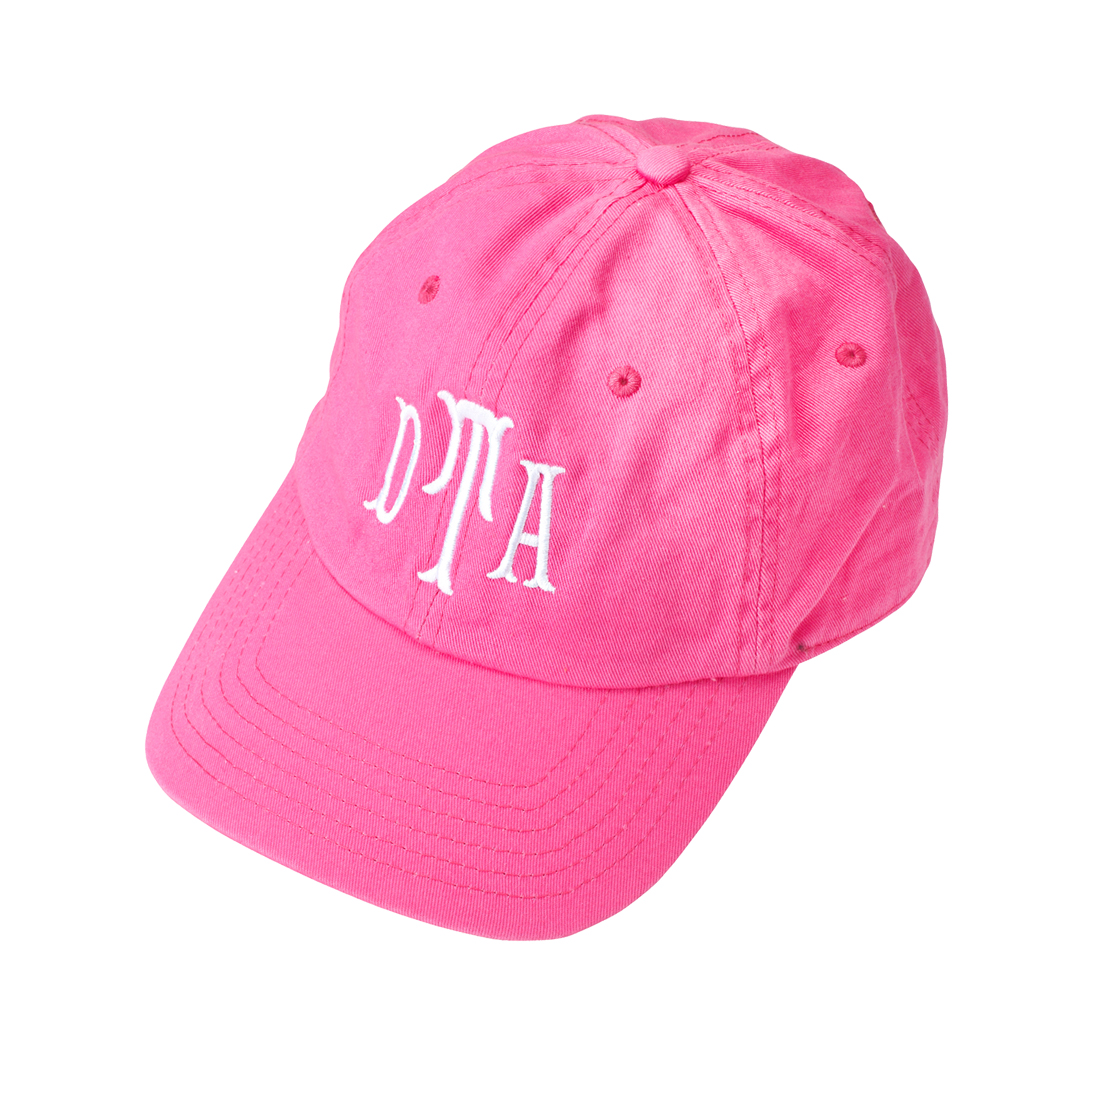 monogrammed baseball cap pink